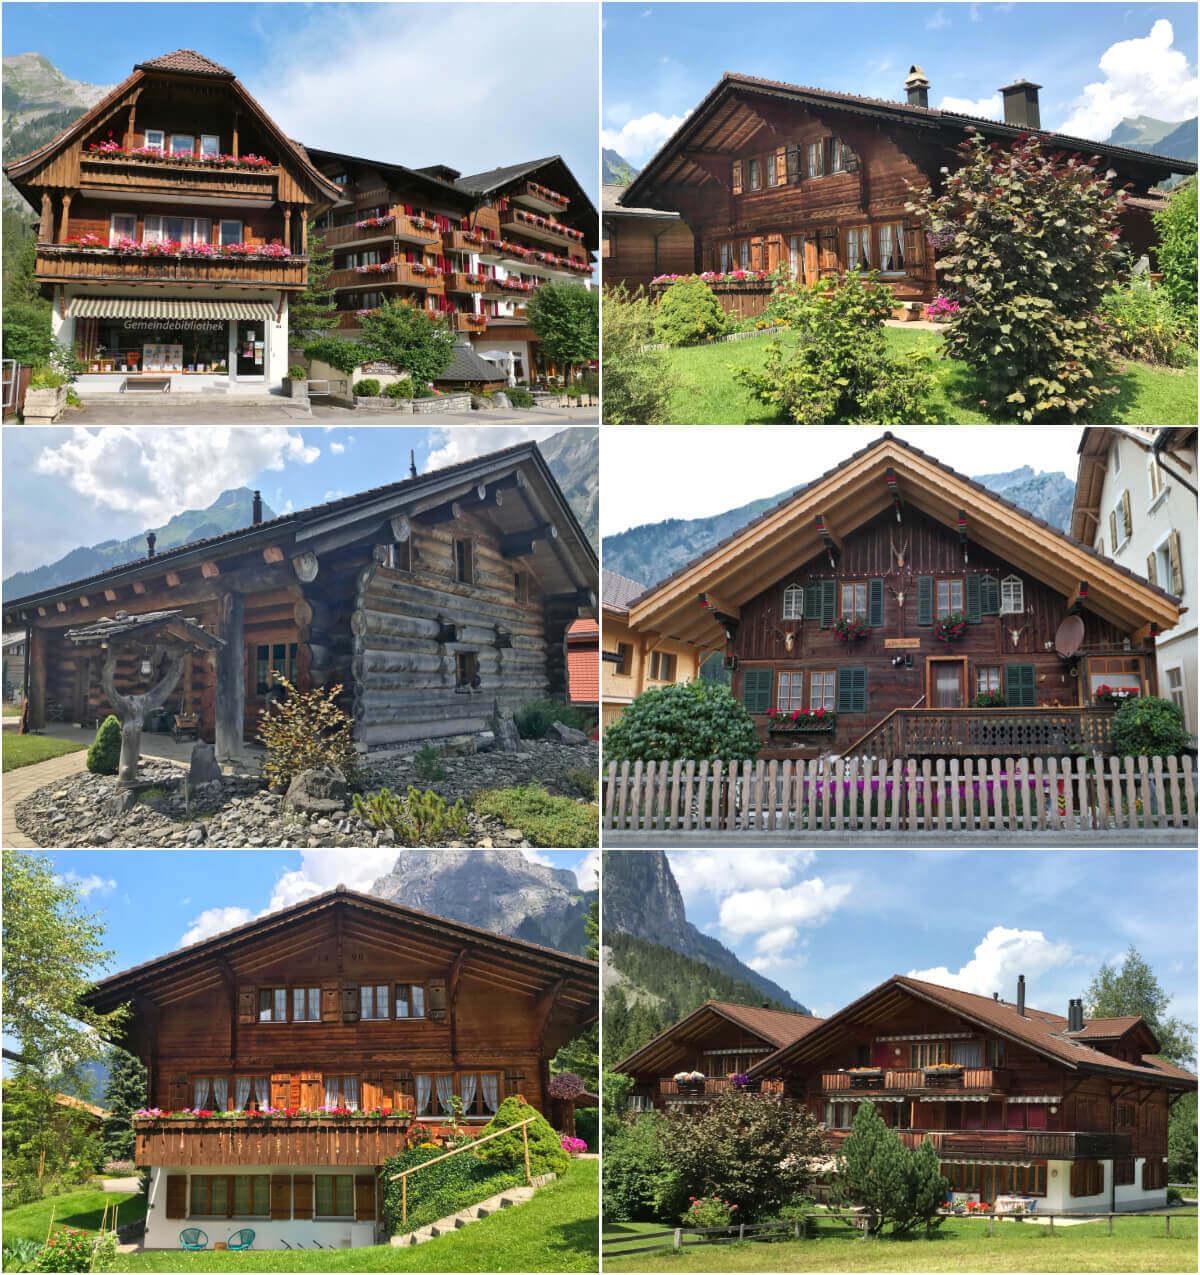 Traditional swiss houses, Kandersteg, Switzerland